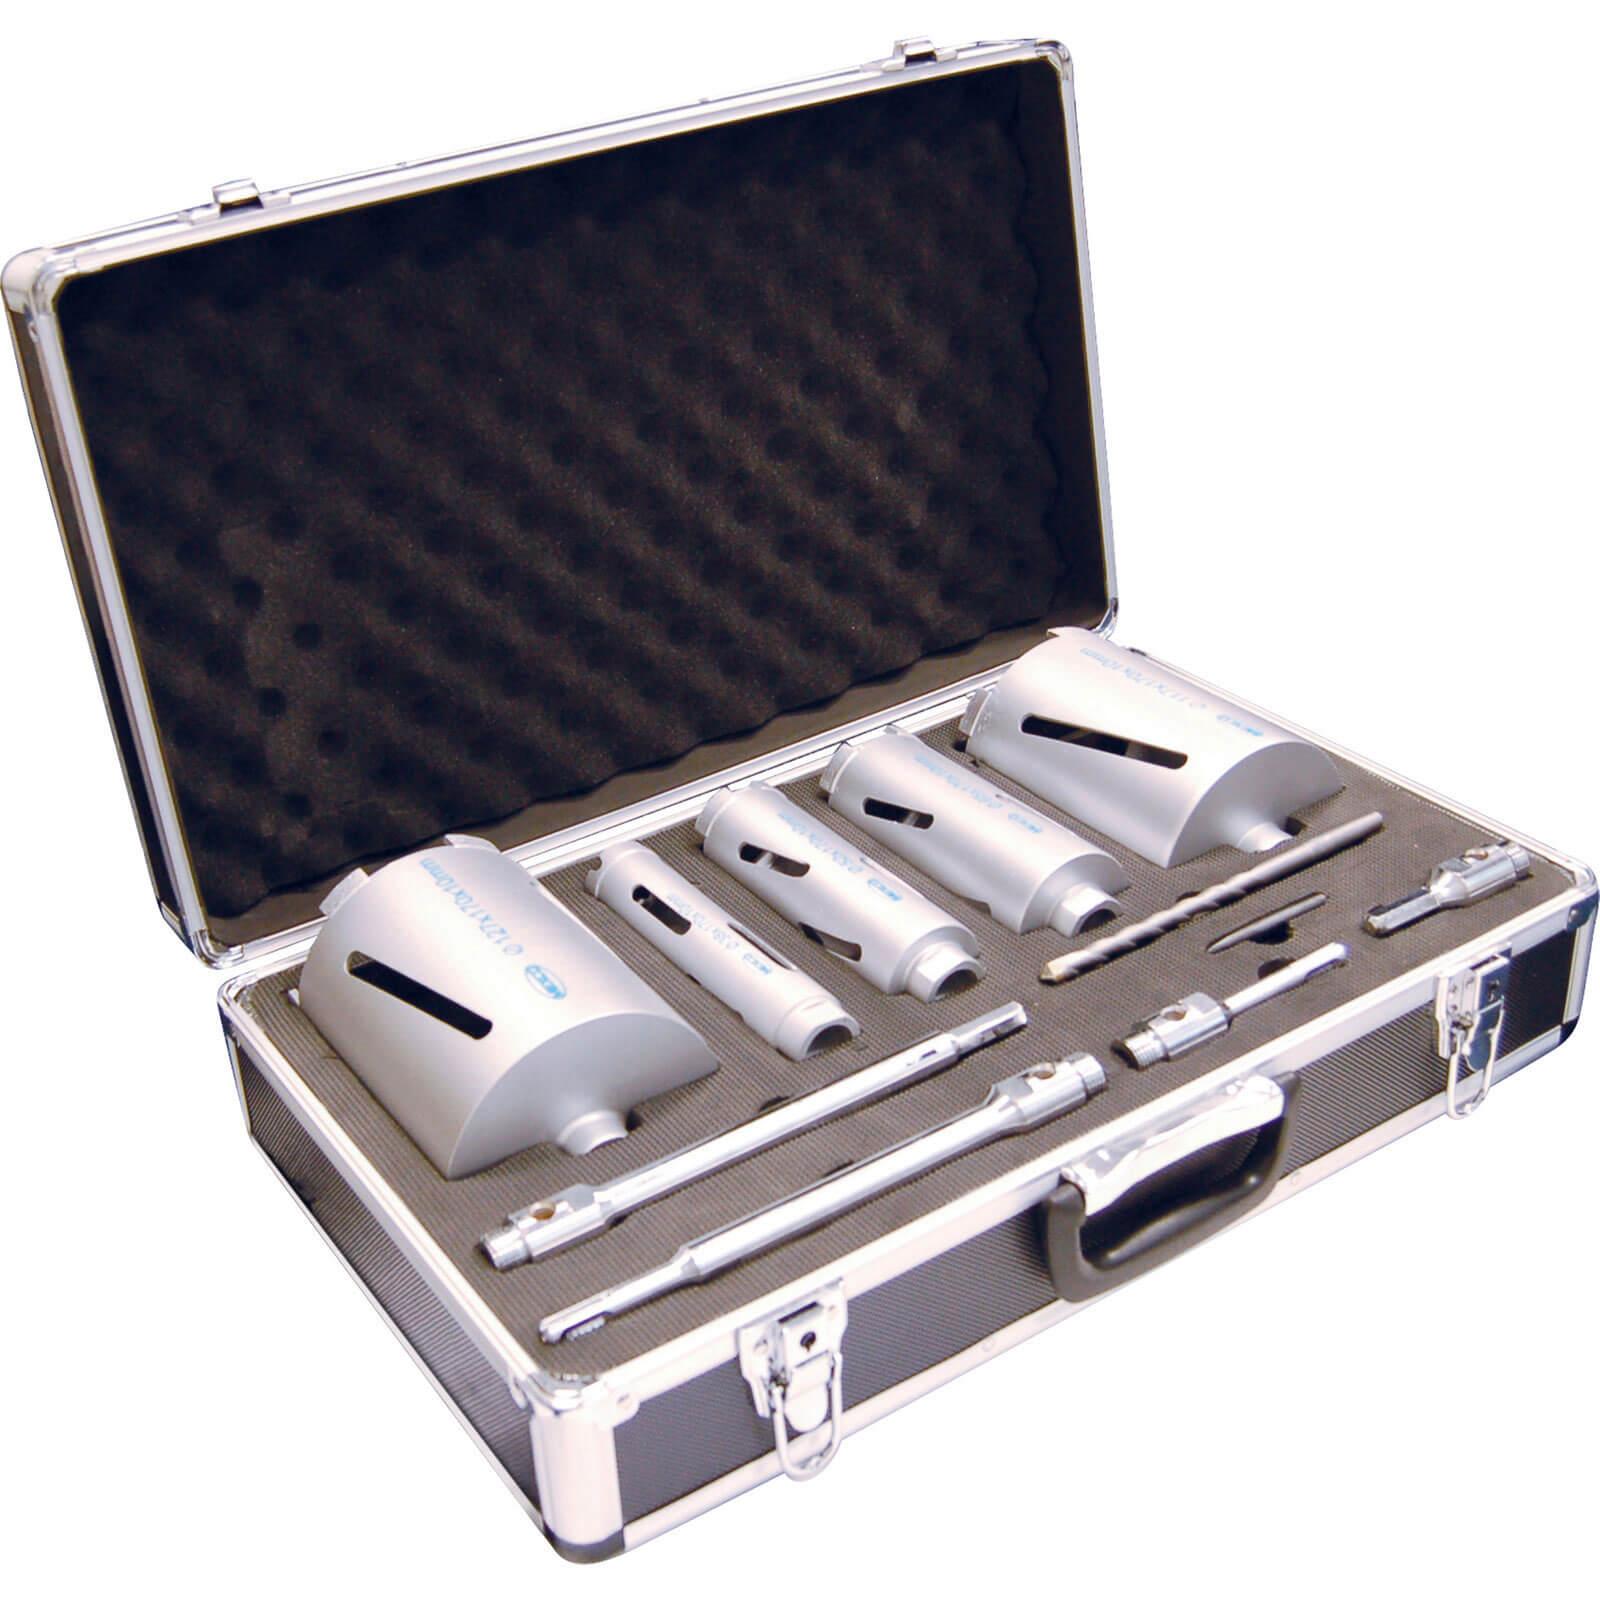 11 Piece Premium Dry Diamond Core Drill Bit Set with Case